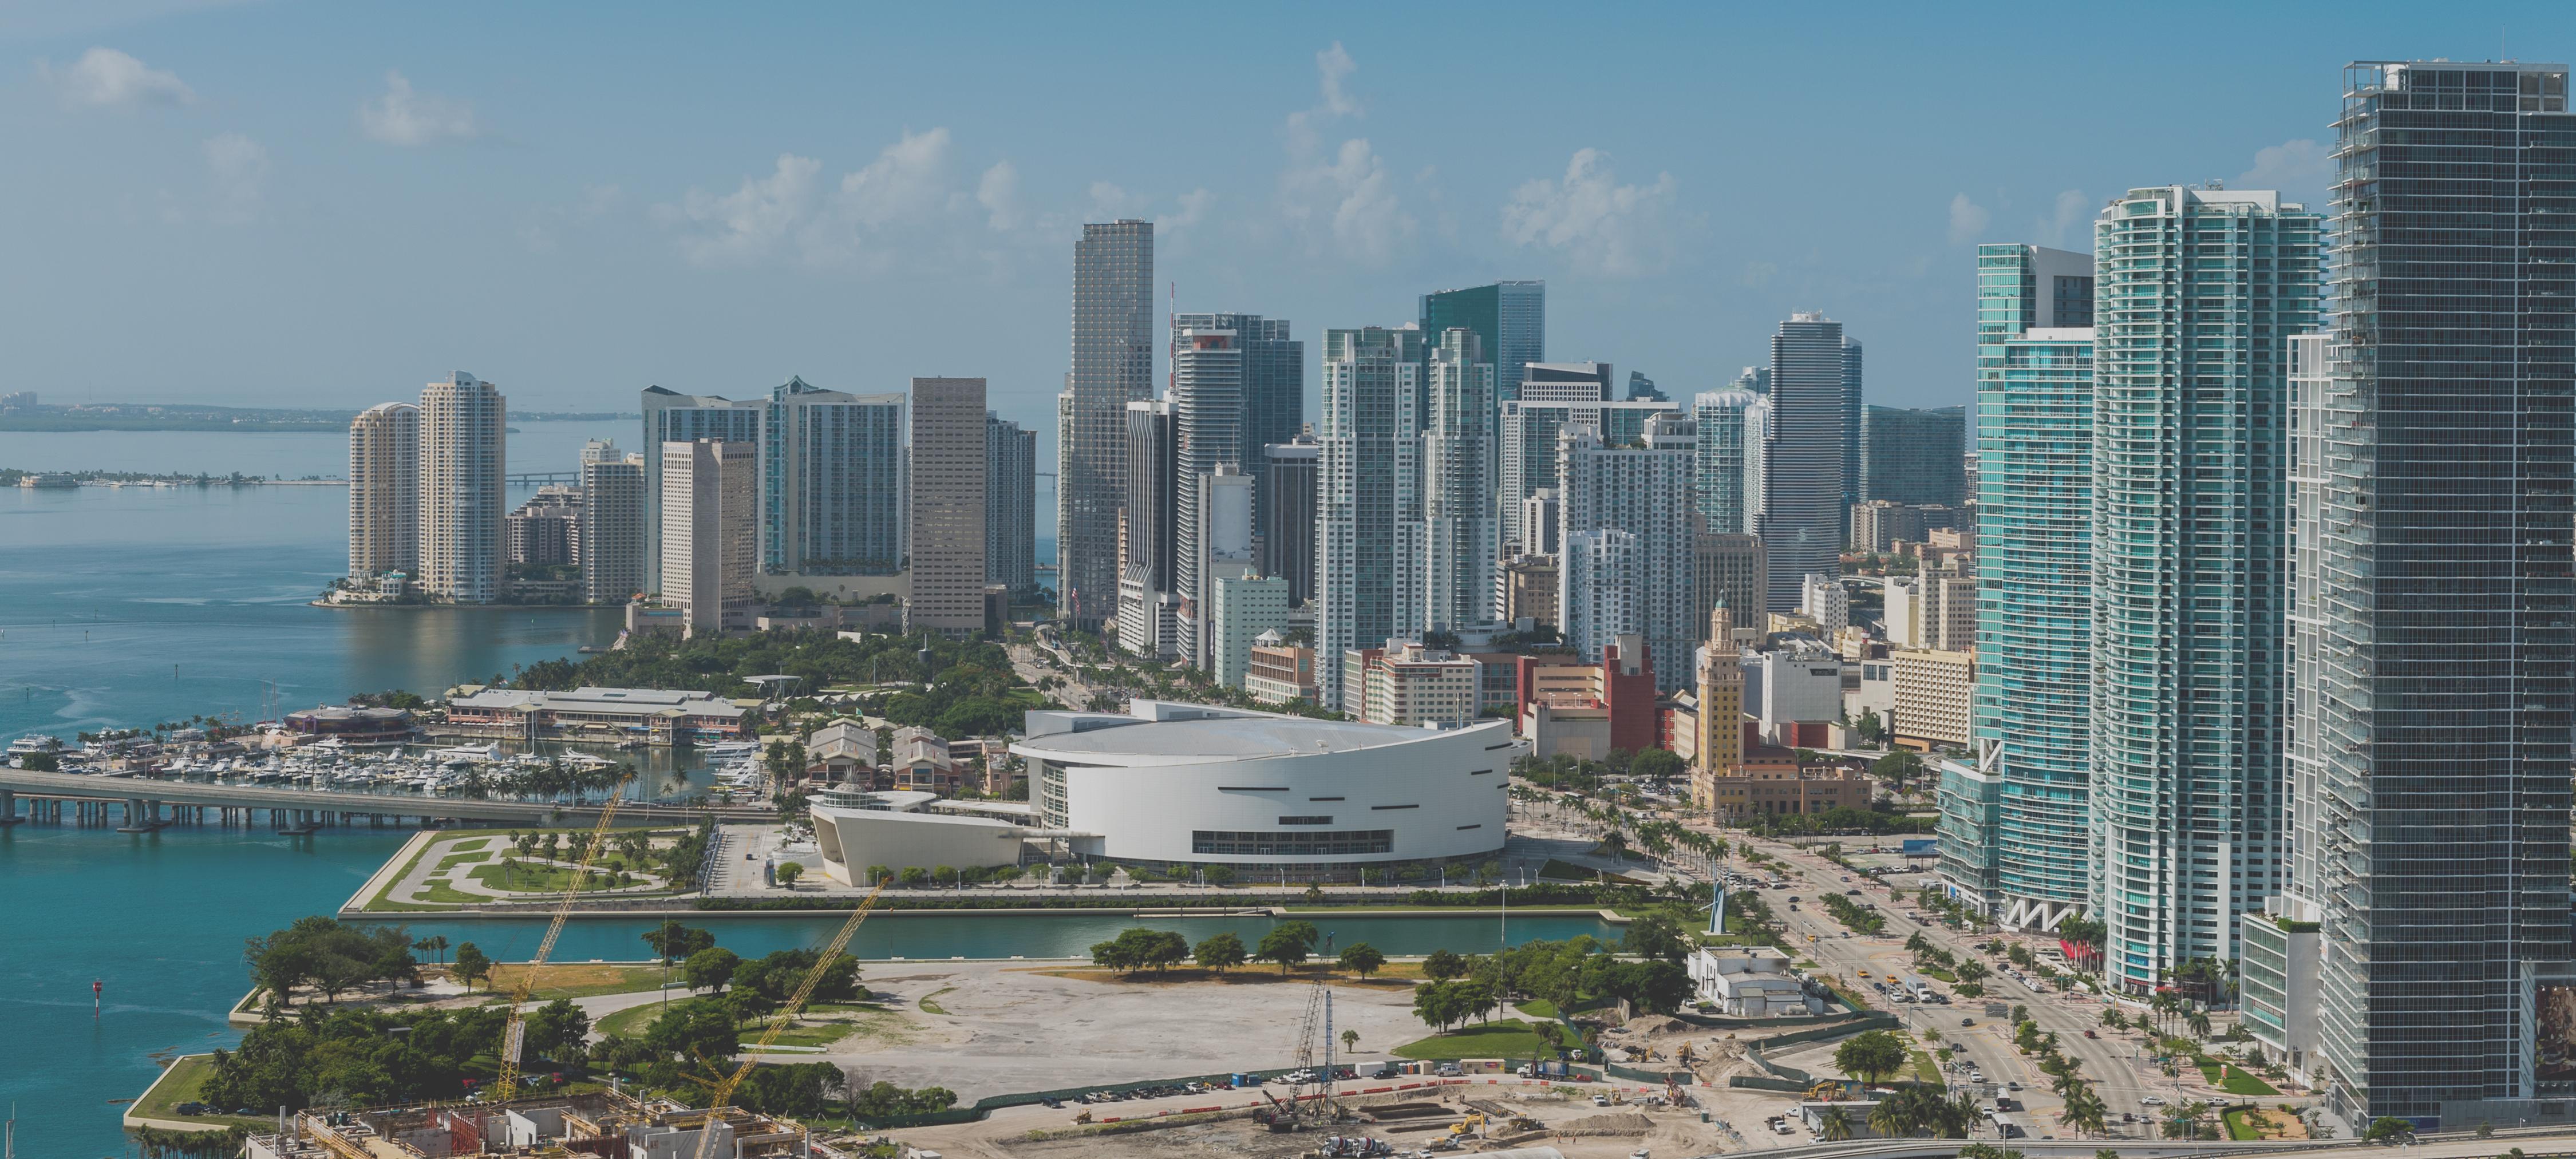 Palm Harbor Homes For Sale >> Homes for Sale Miami FL - Search MLS Miami